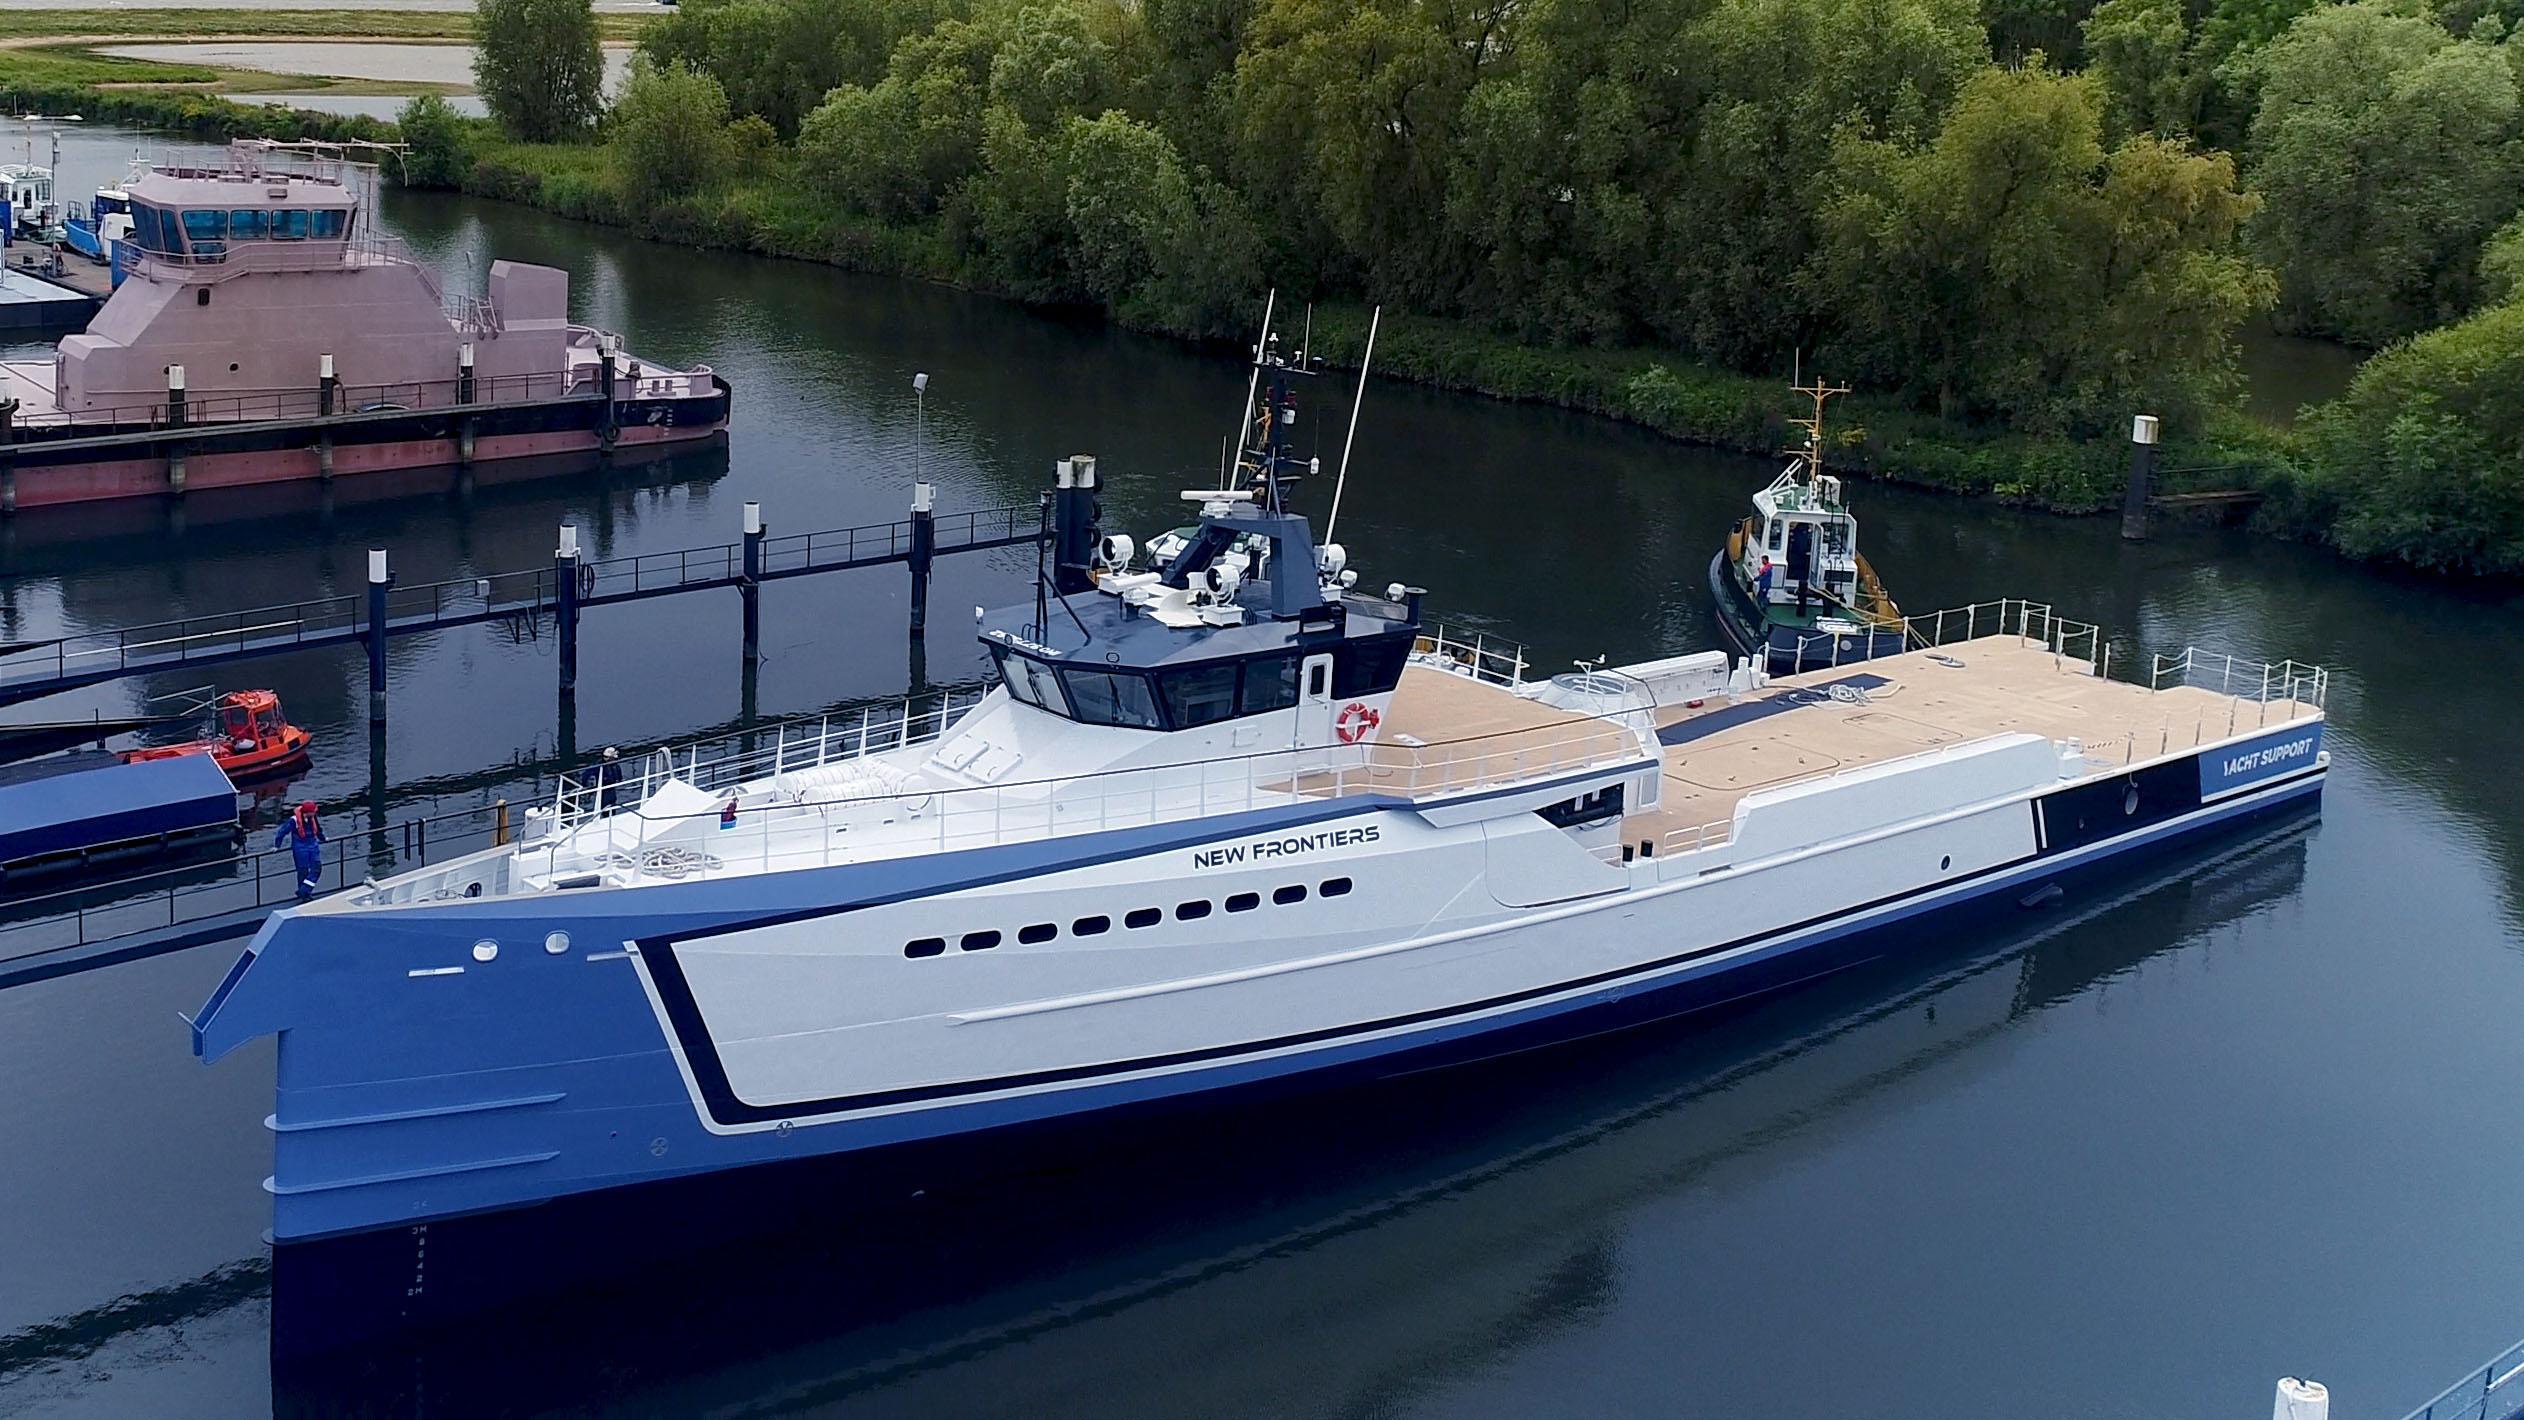 shadow new frontiers motoryacht damen 55m 2017 launch profile